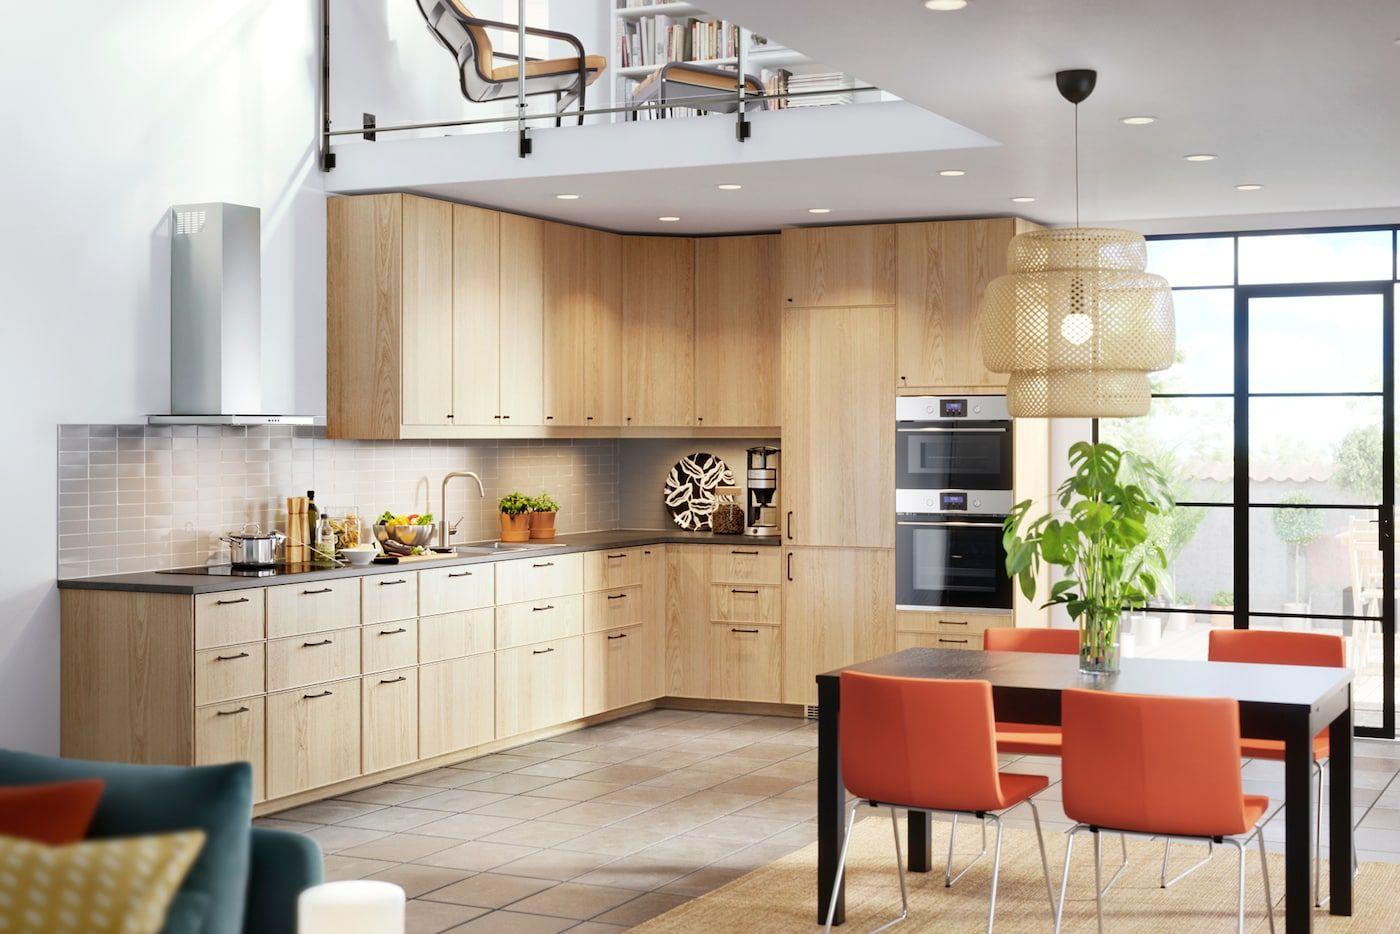 ett modernt k k med ekestad k kslucka i ljus ek vaskerom pinterest villas and kitchens. Black Bedroom Furniture Sets. Home Design Ideas